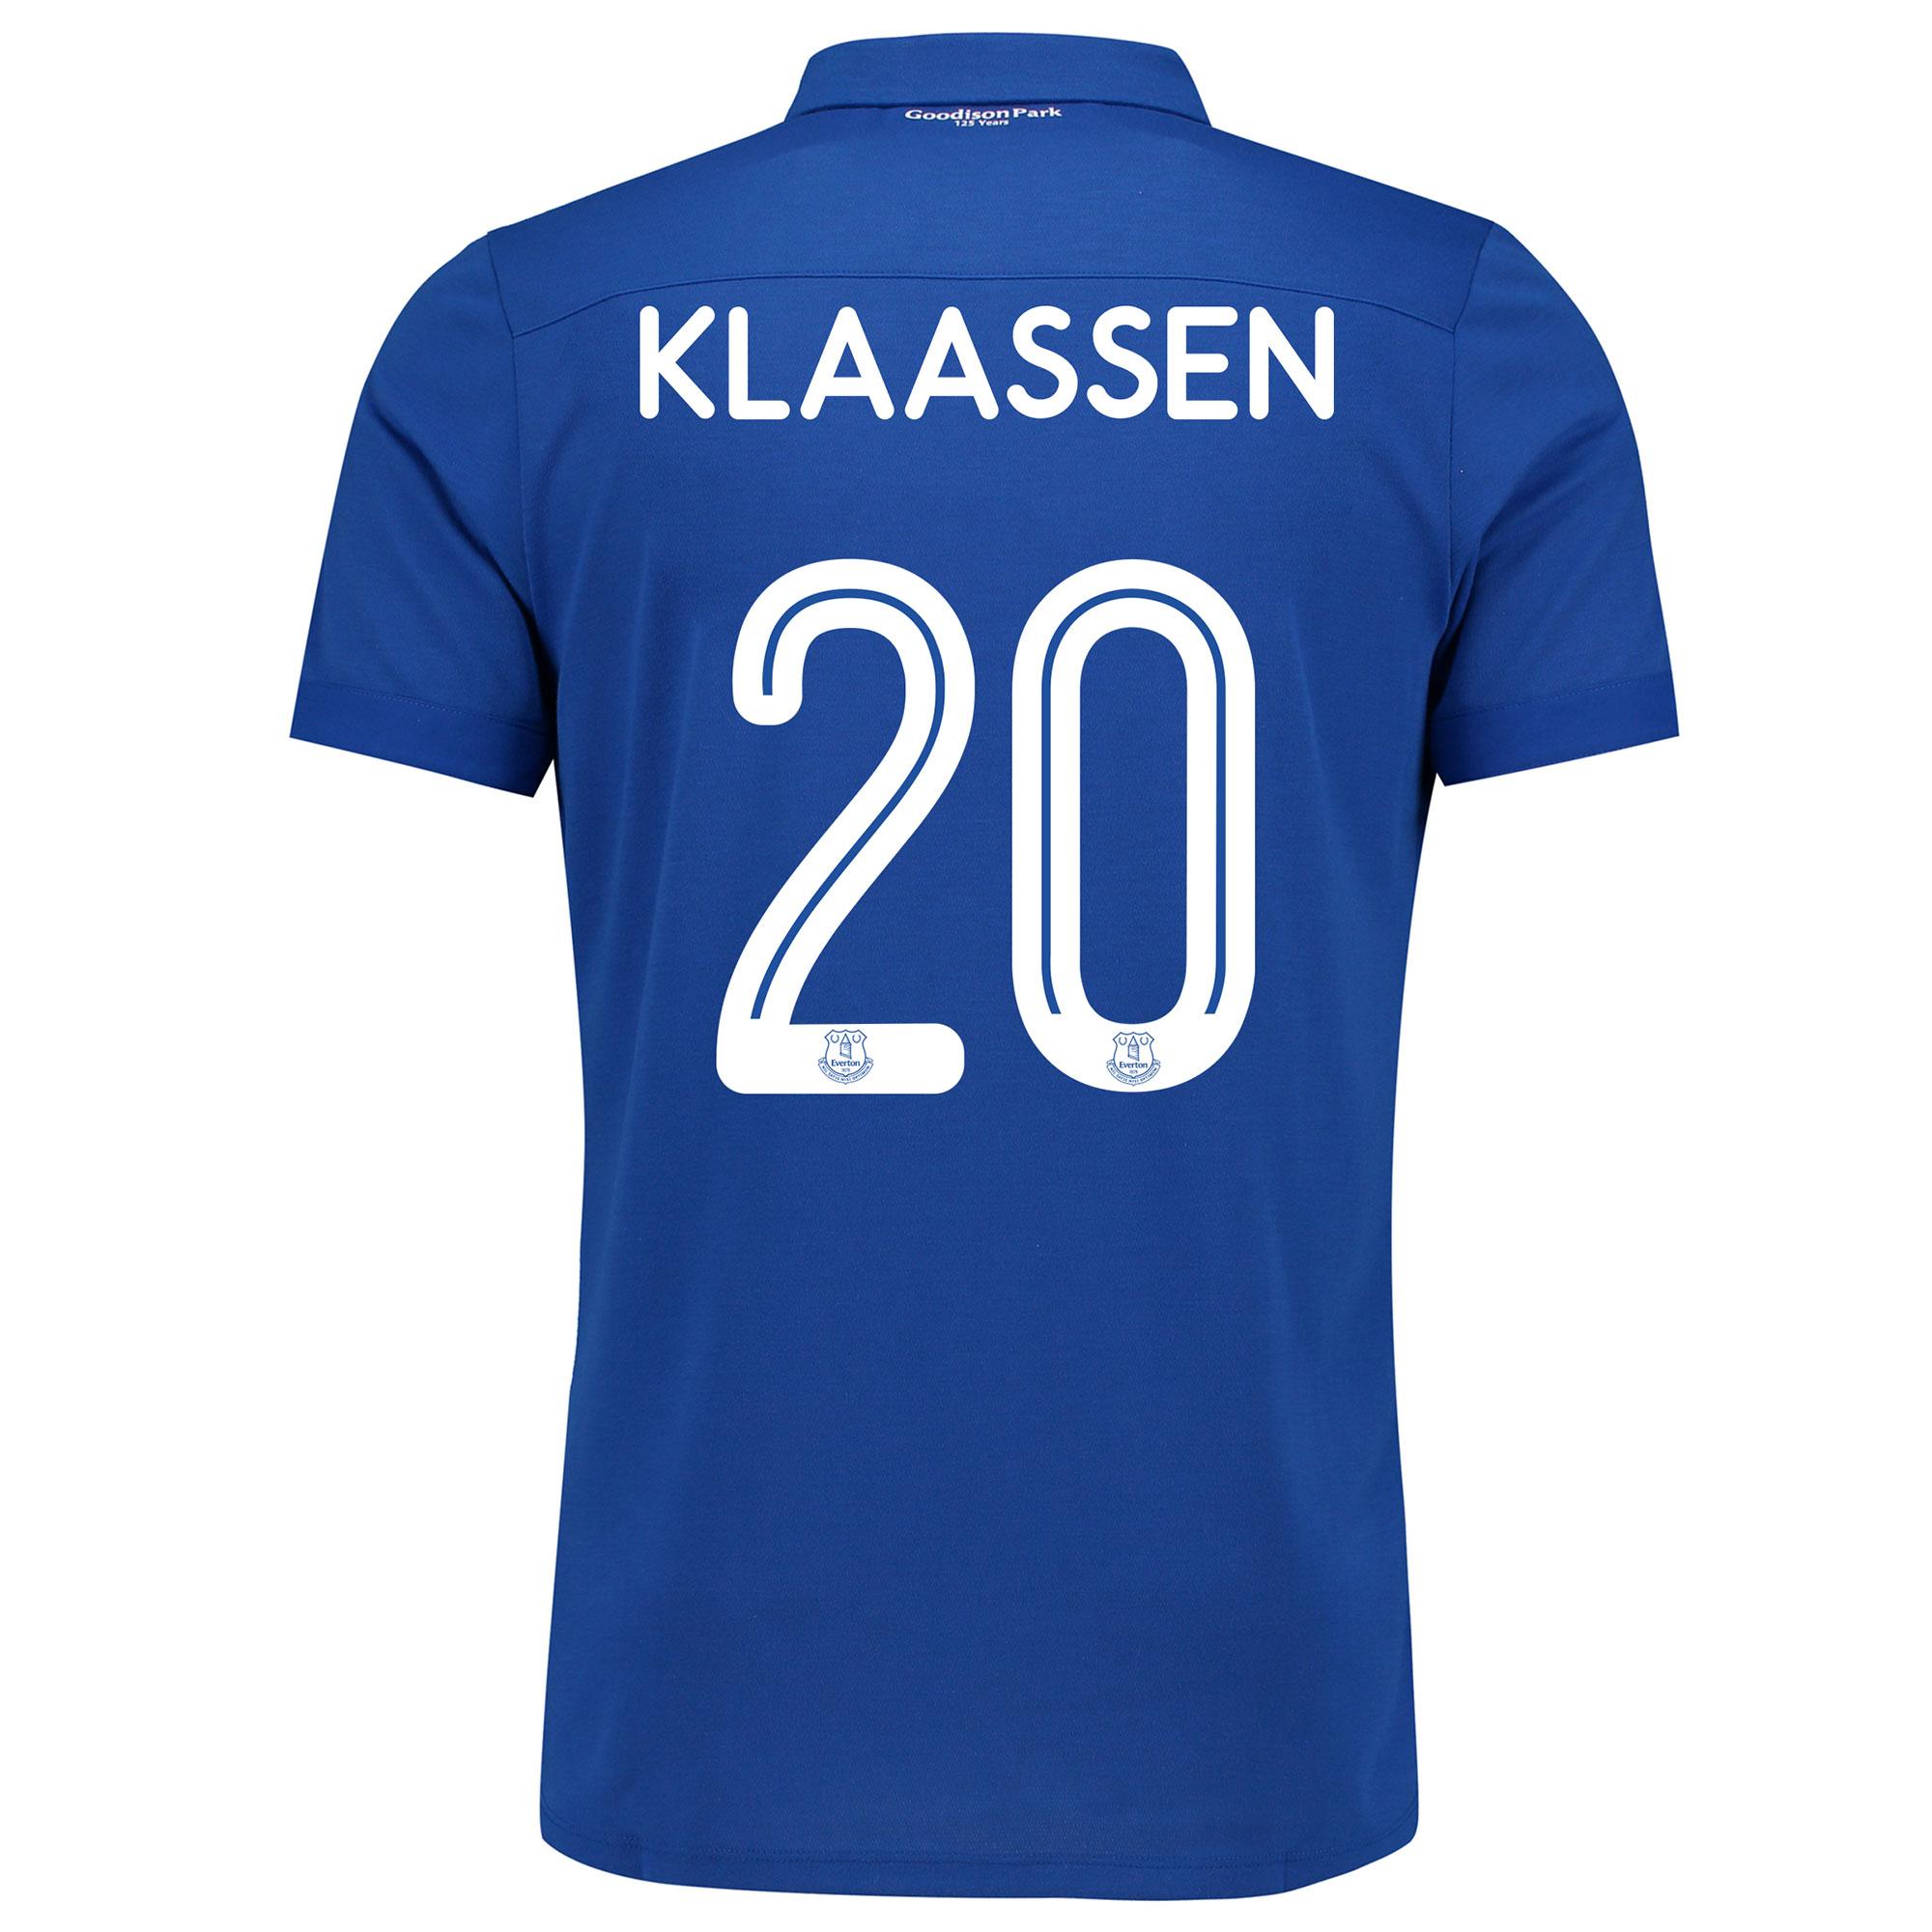 Image of Everton Commemorative Shirt - Junior with Klaassen 20 printing